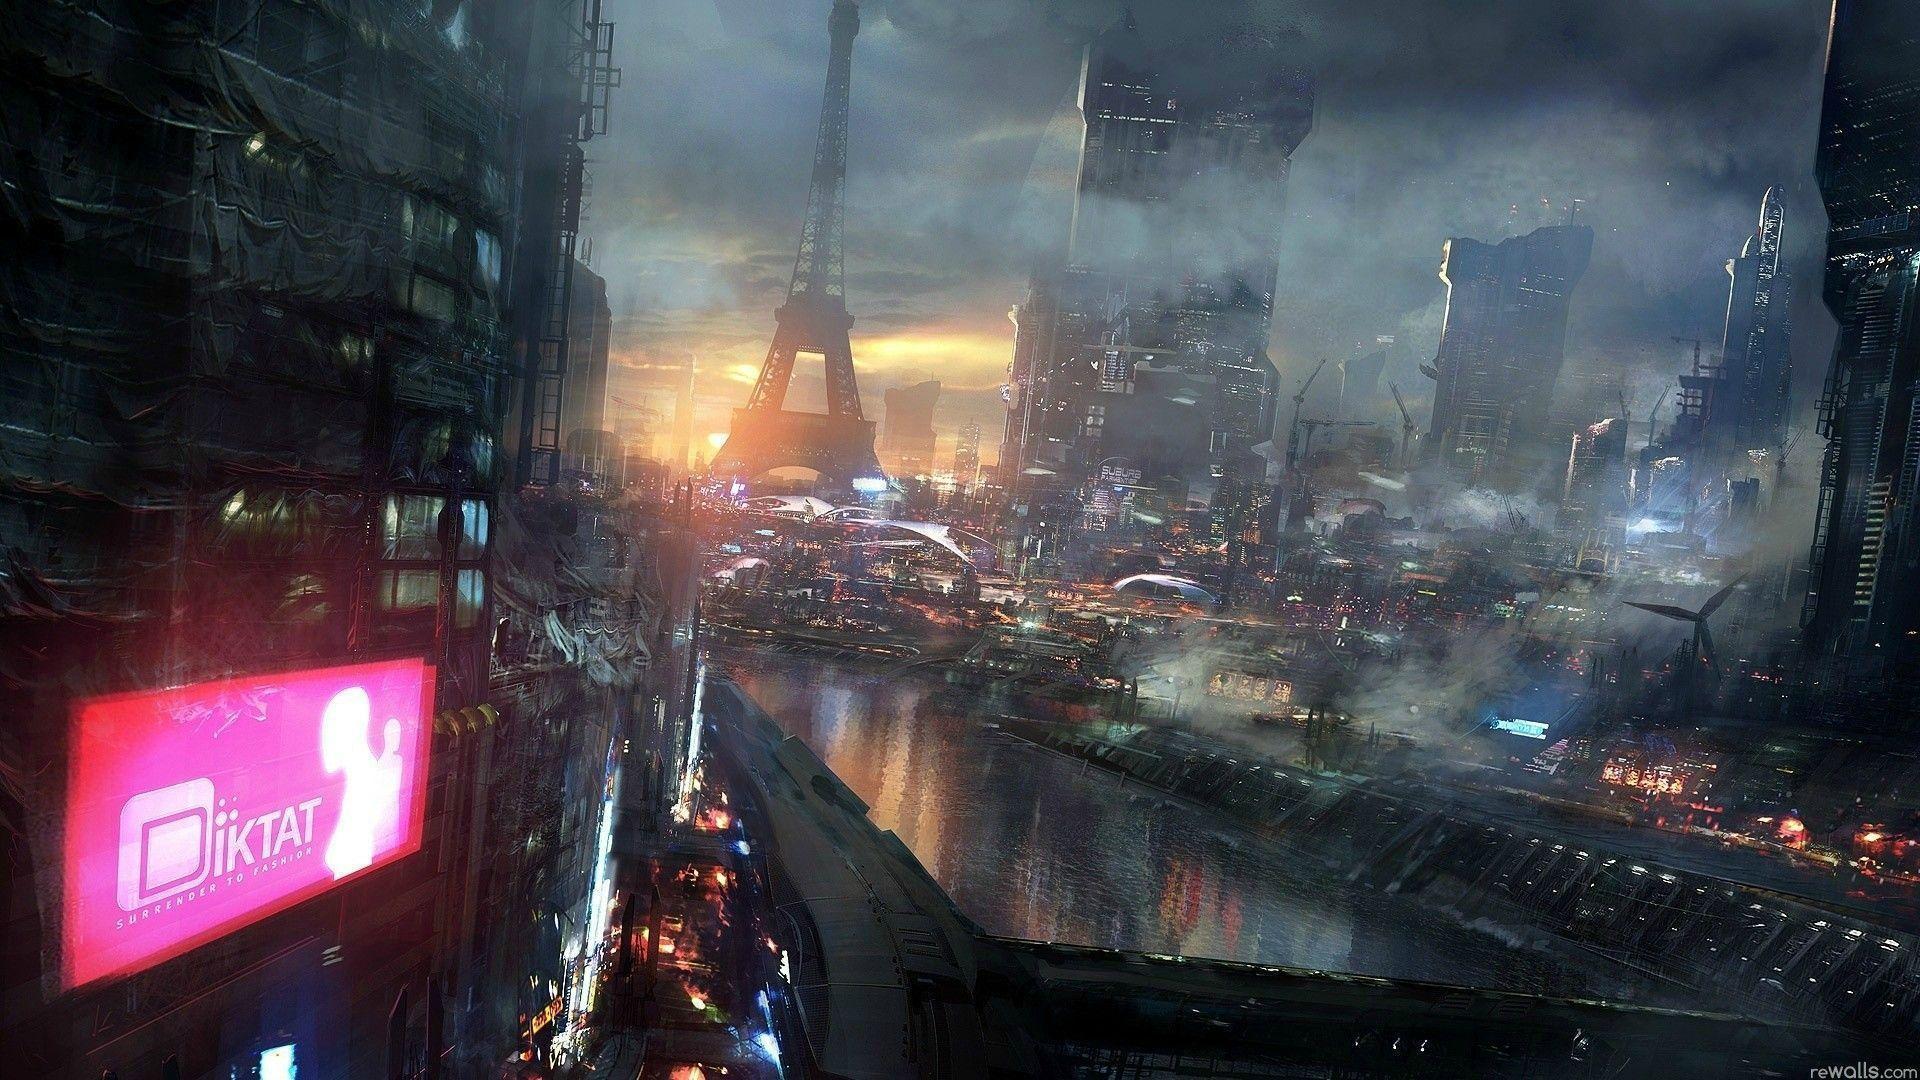 cyberpunk city hd wallpapers - photo #2